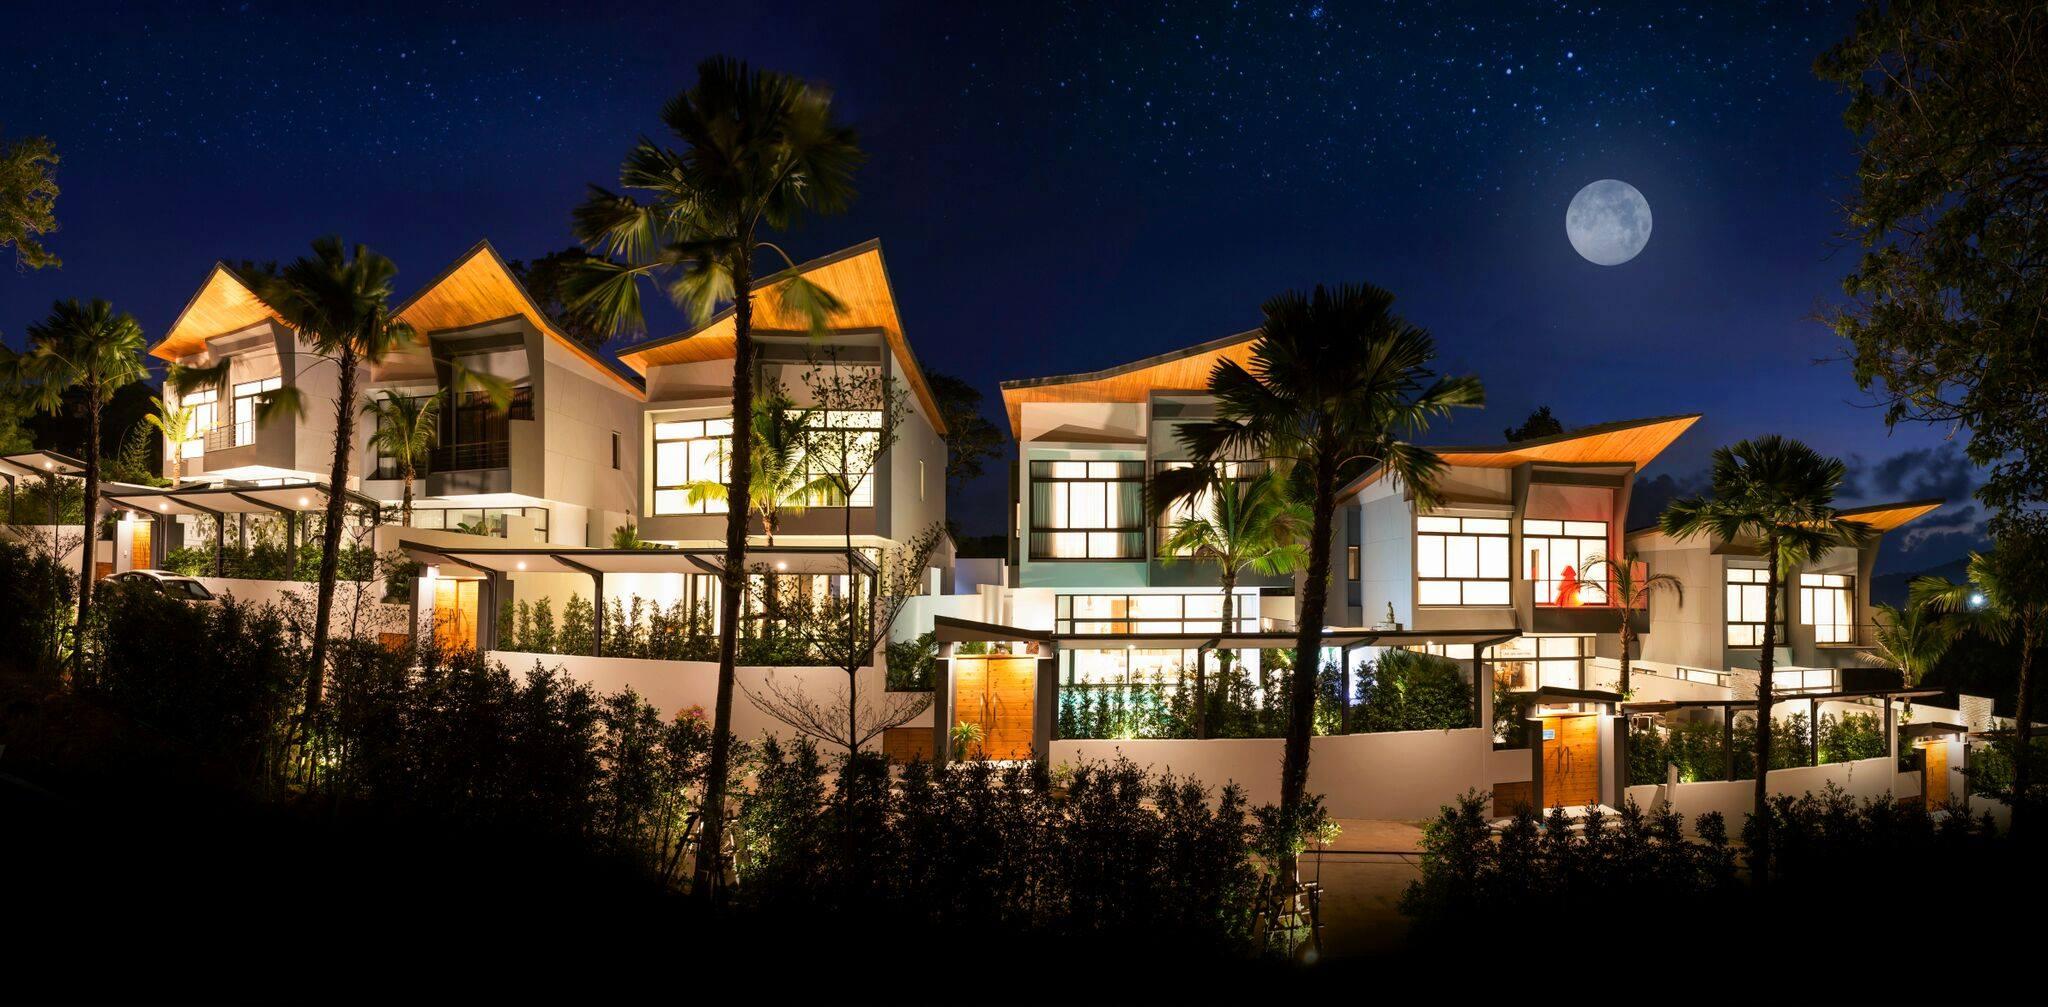 Phuket Real Estate Agency – Nai Harn Beach (29)